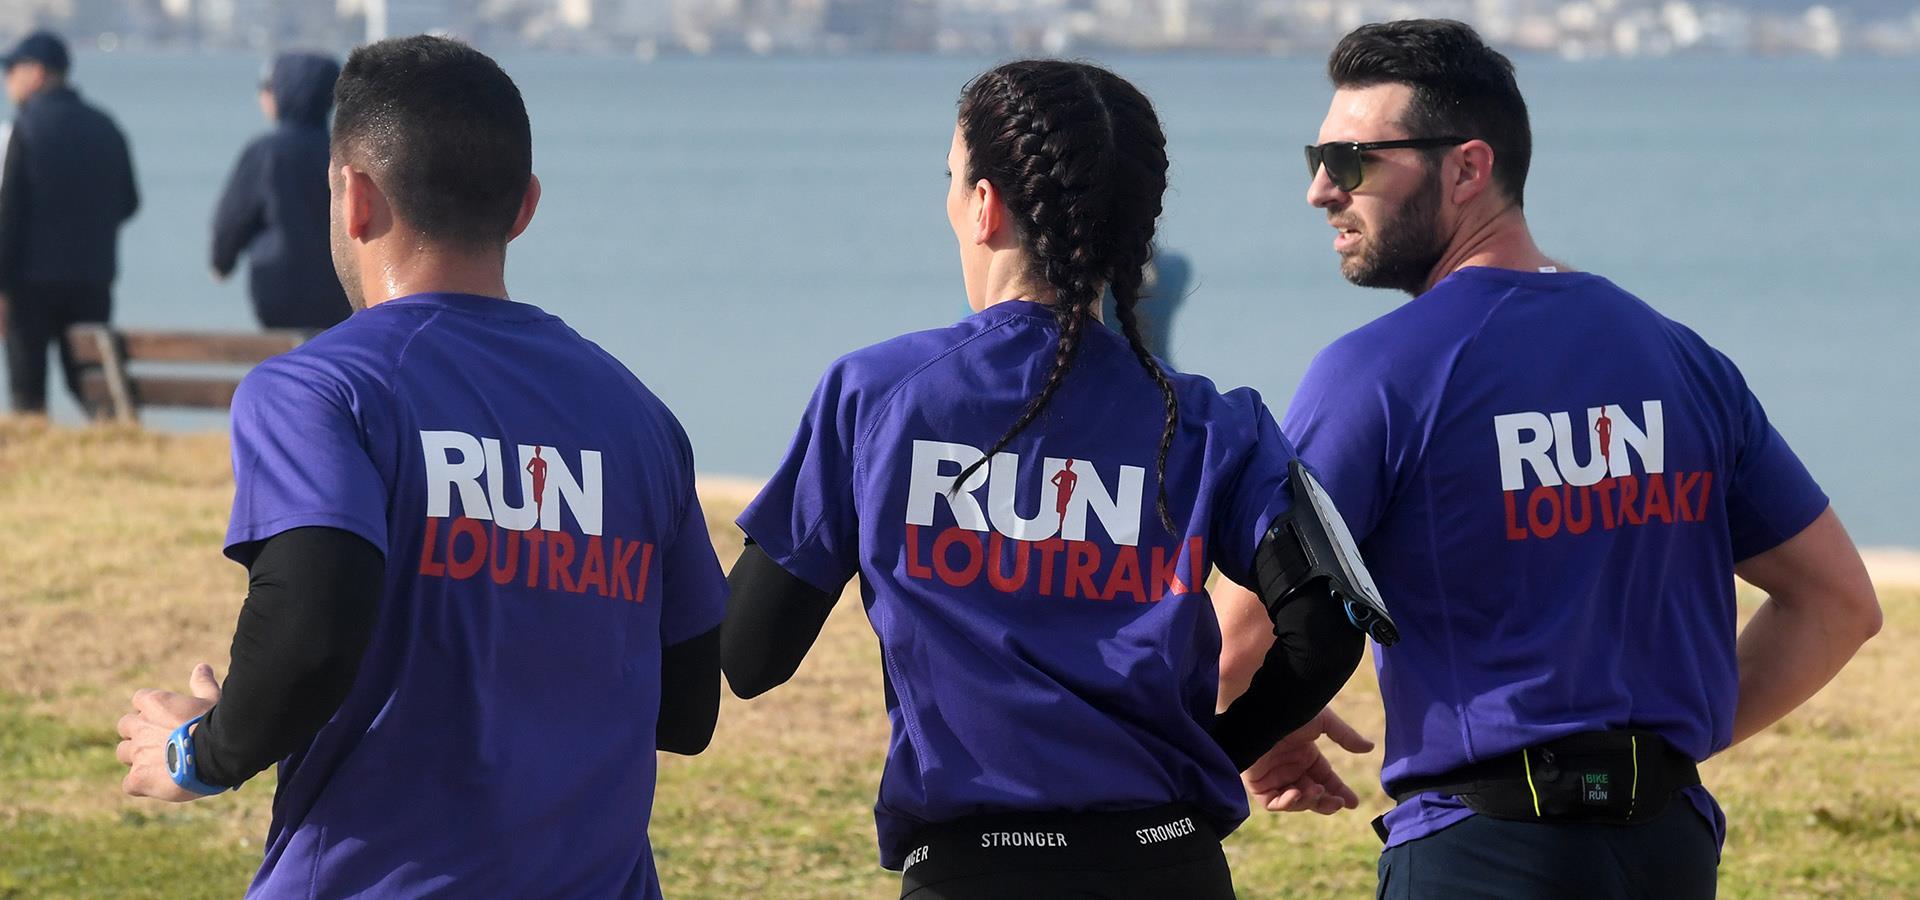 Loutraki Run 2020